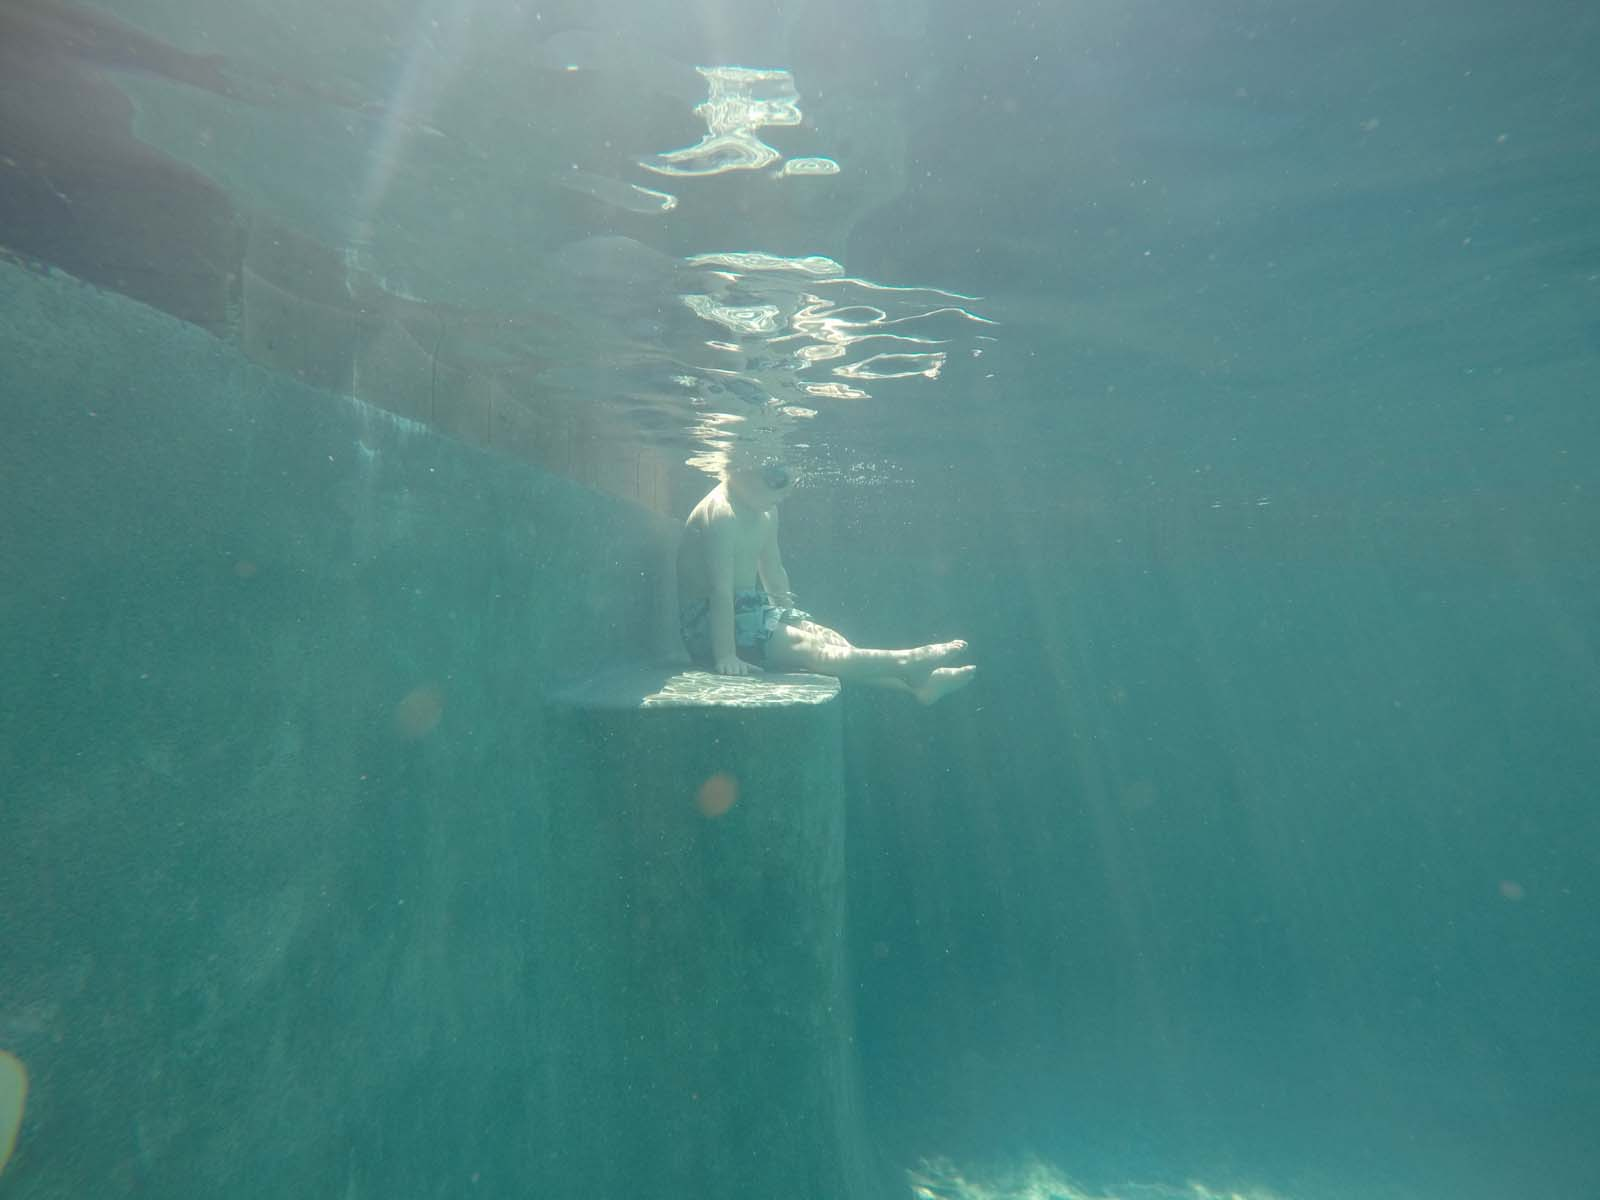 unedited (SOOC) image for boy underwater